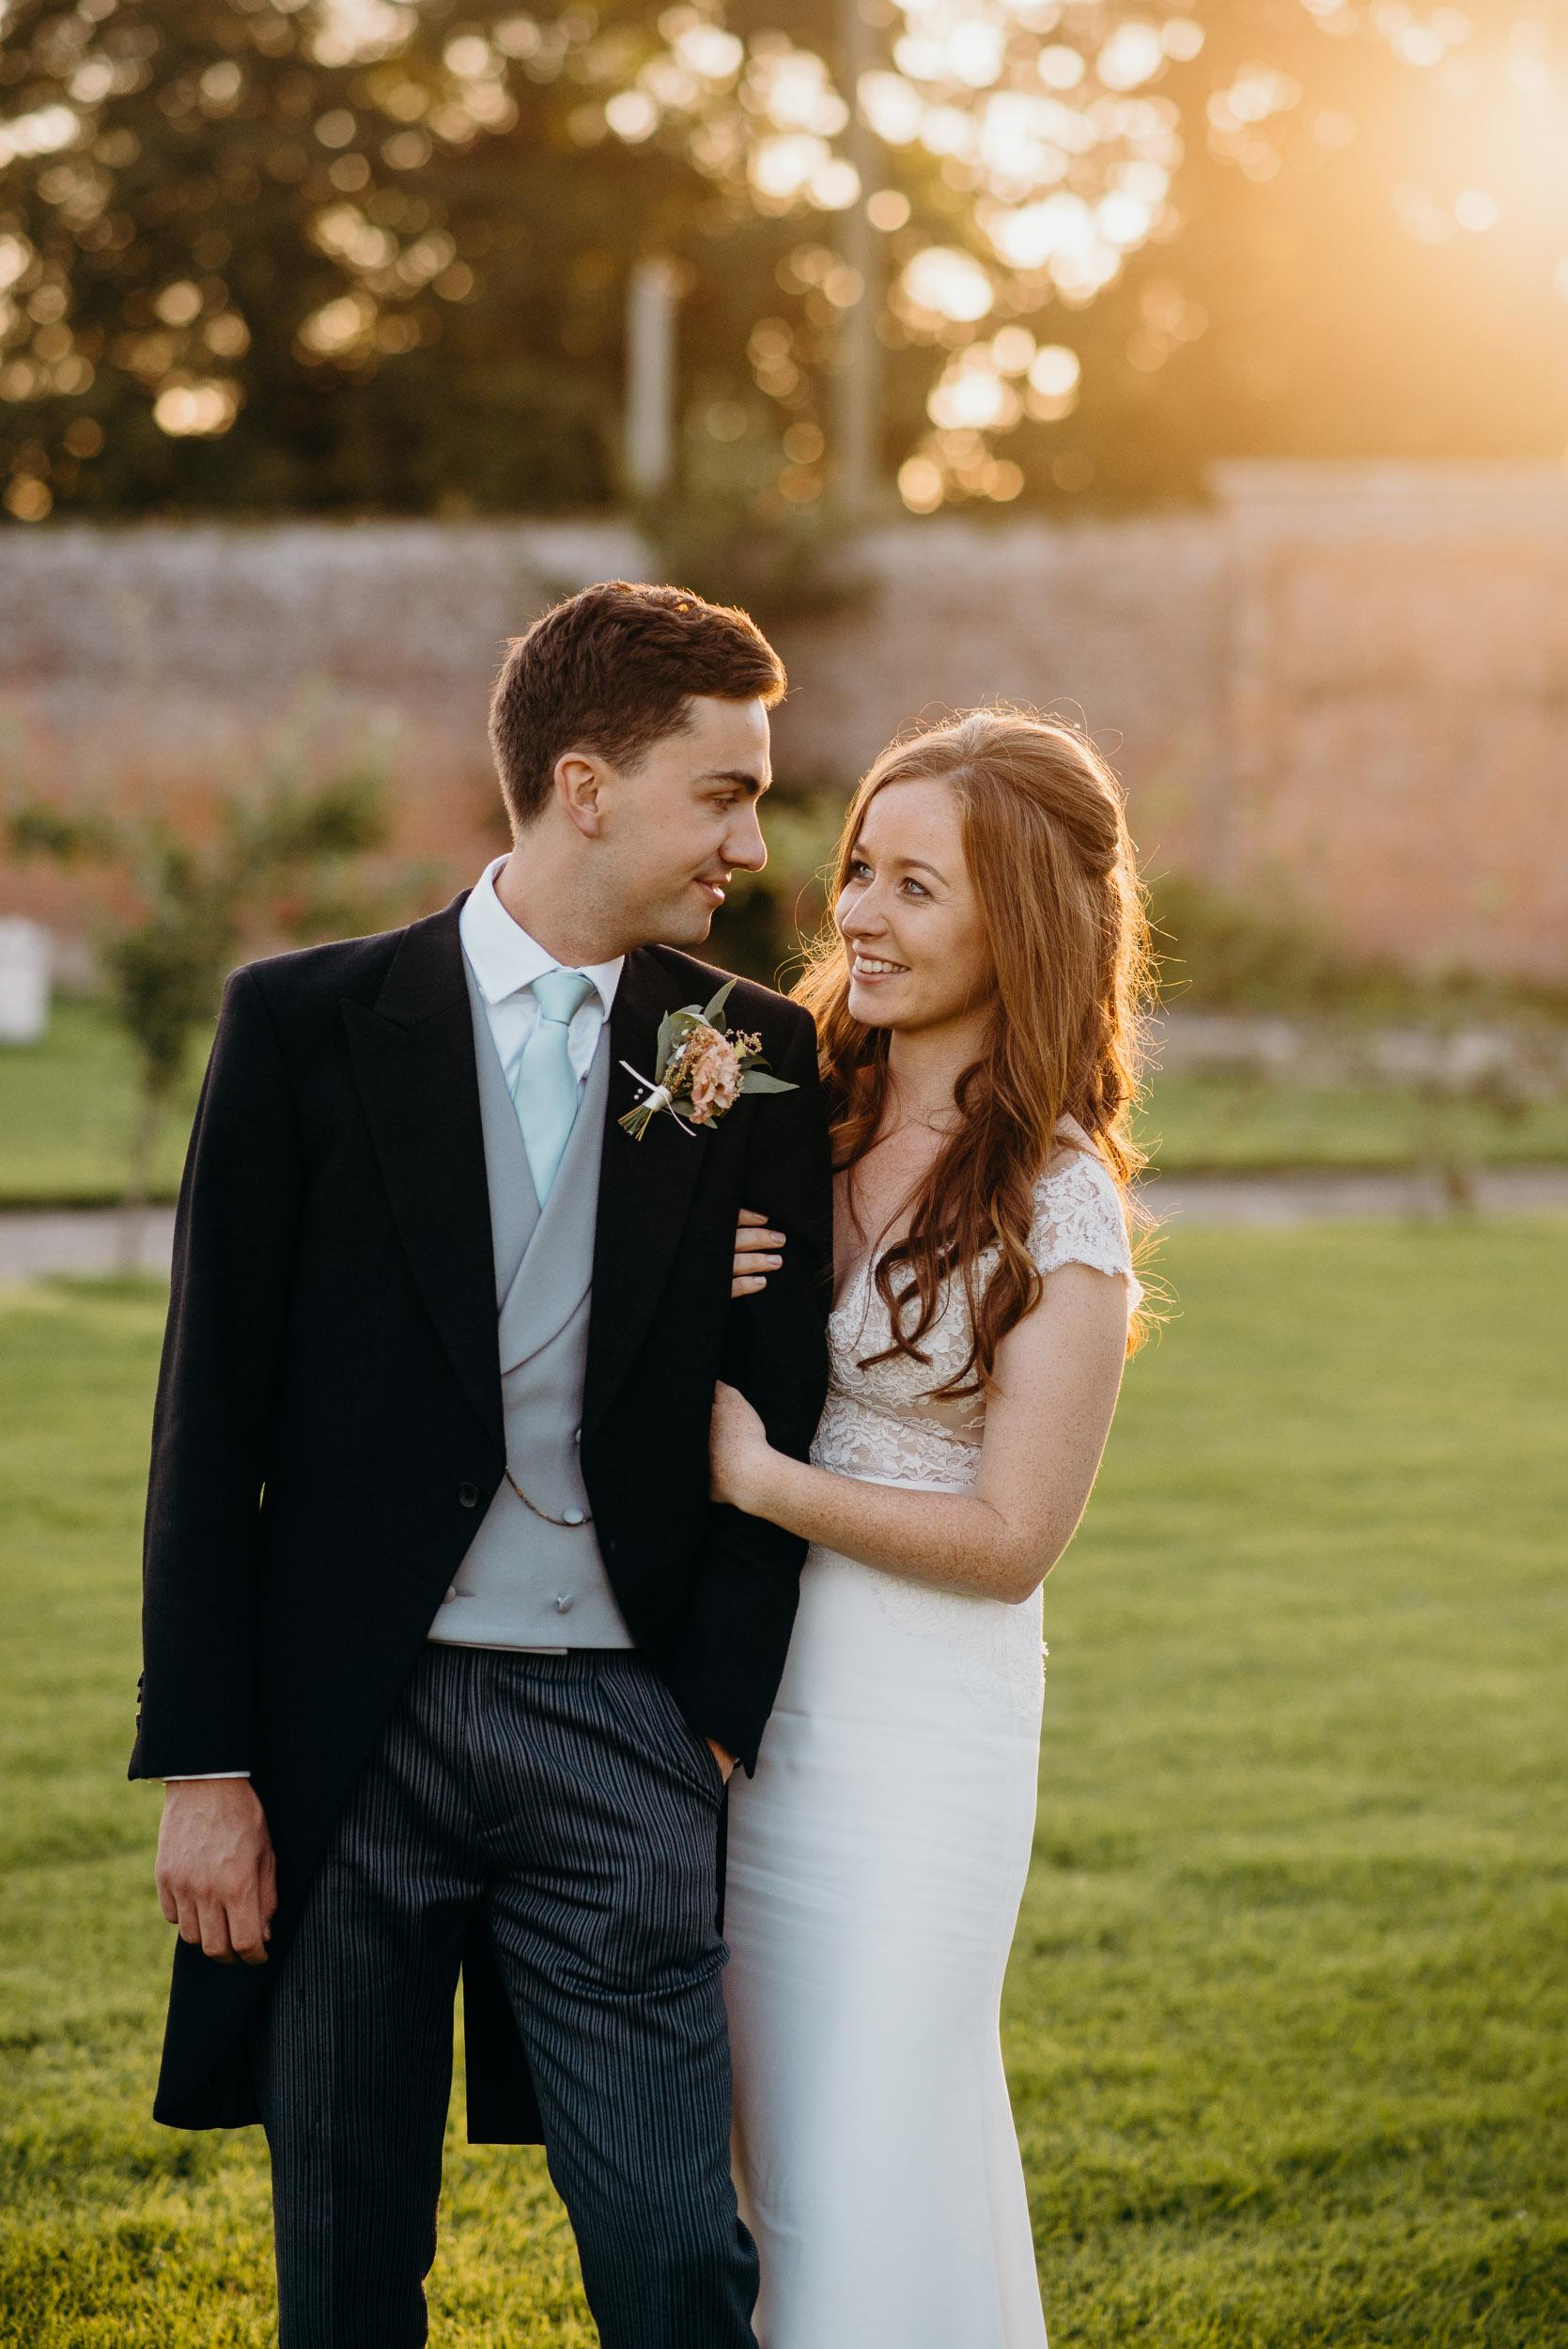 drenagh estate wedding photography-121.jpg